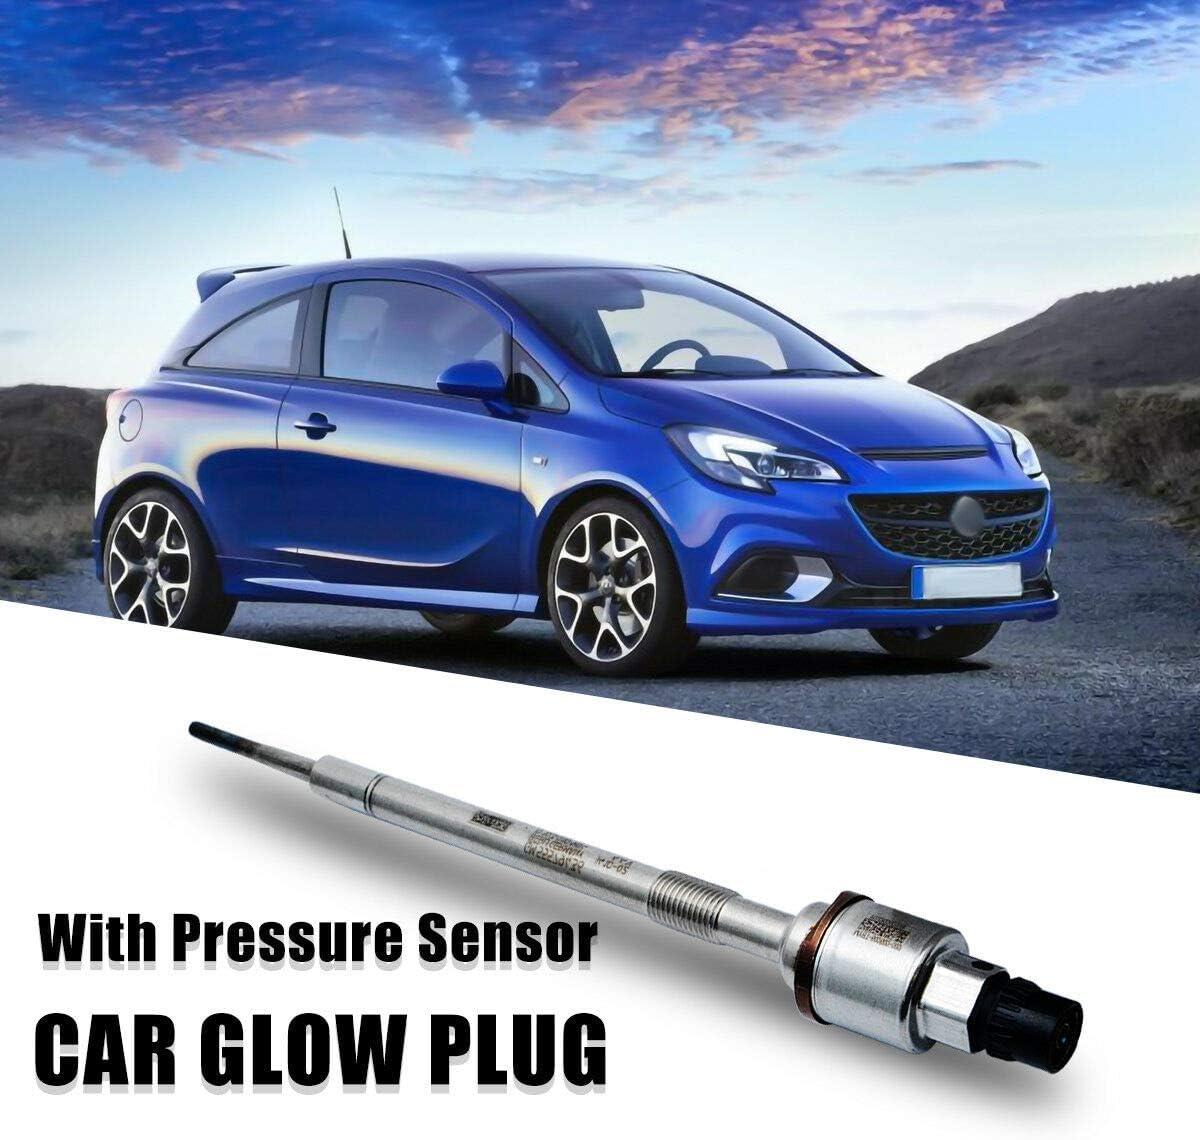 MASO Glow Plug 55579436 with Pressure Sensor Fit for Vauxhall Astra Opel GMC 2.0 CDTI